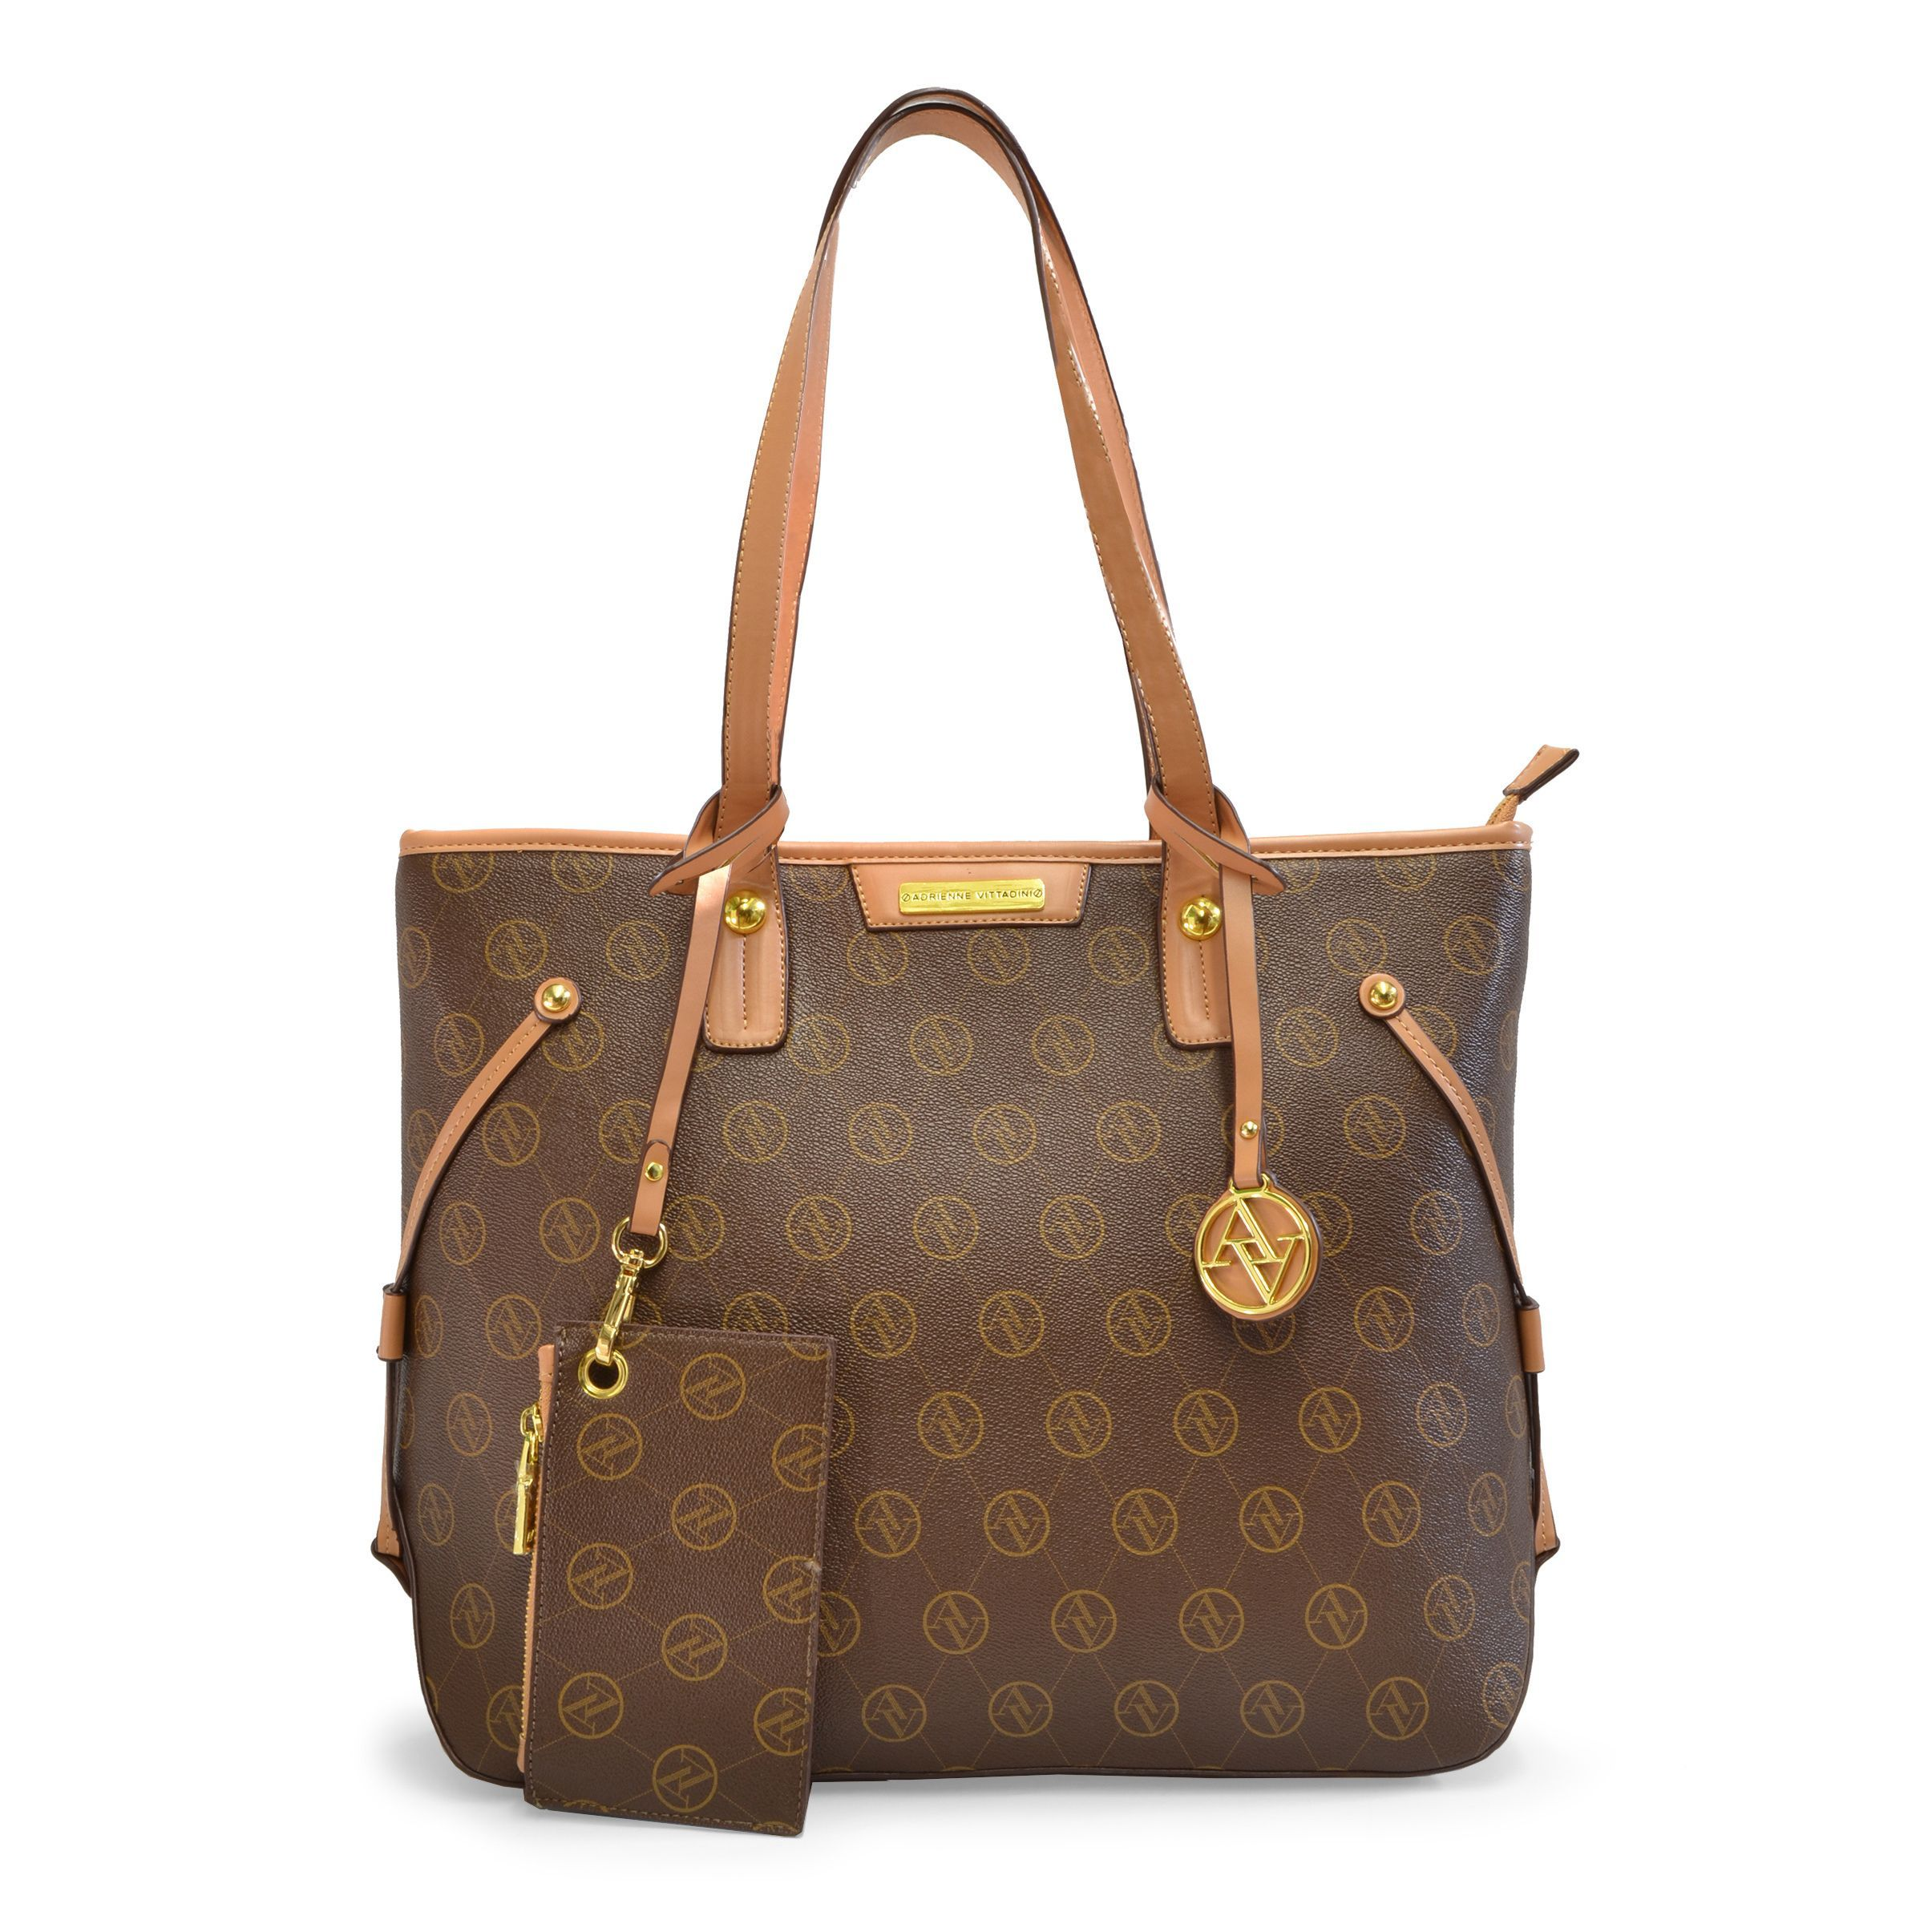 b0b96159d47 Adrienne Vittadini Signature Vegan Tote Bag, Women's | Beauty | Bags ...